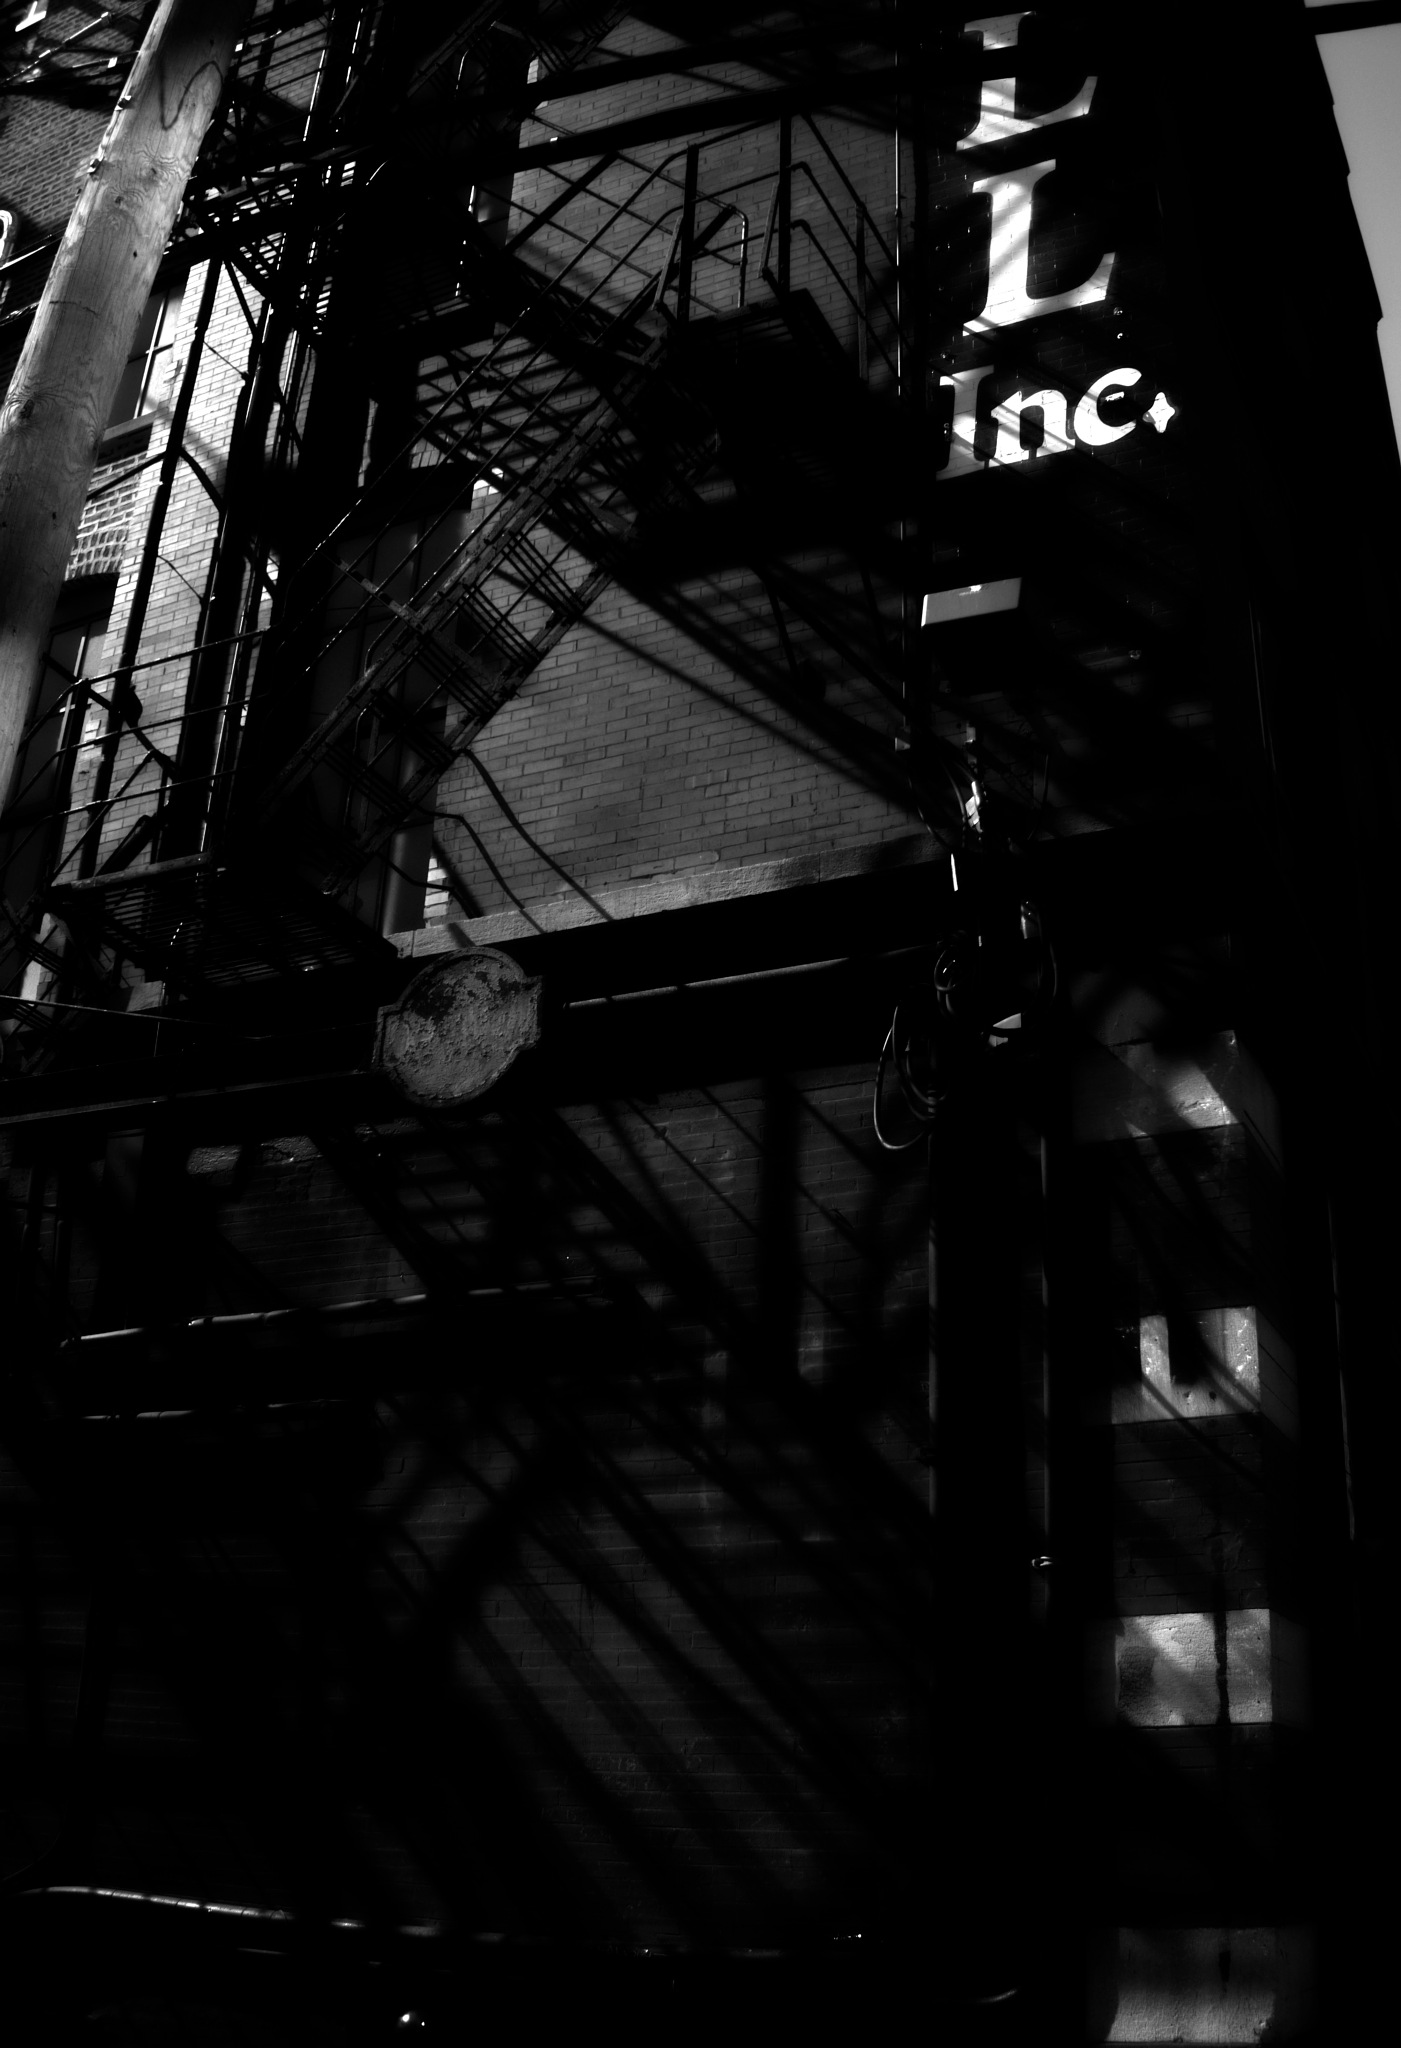 LL INC by David DeBord